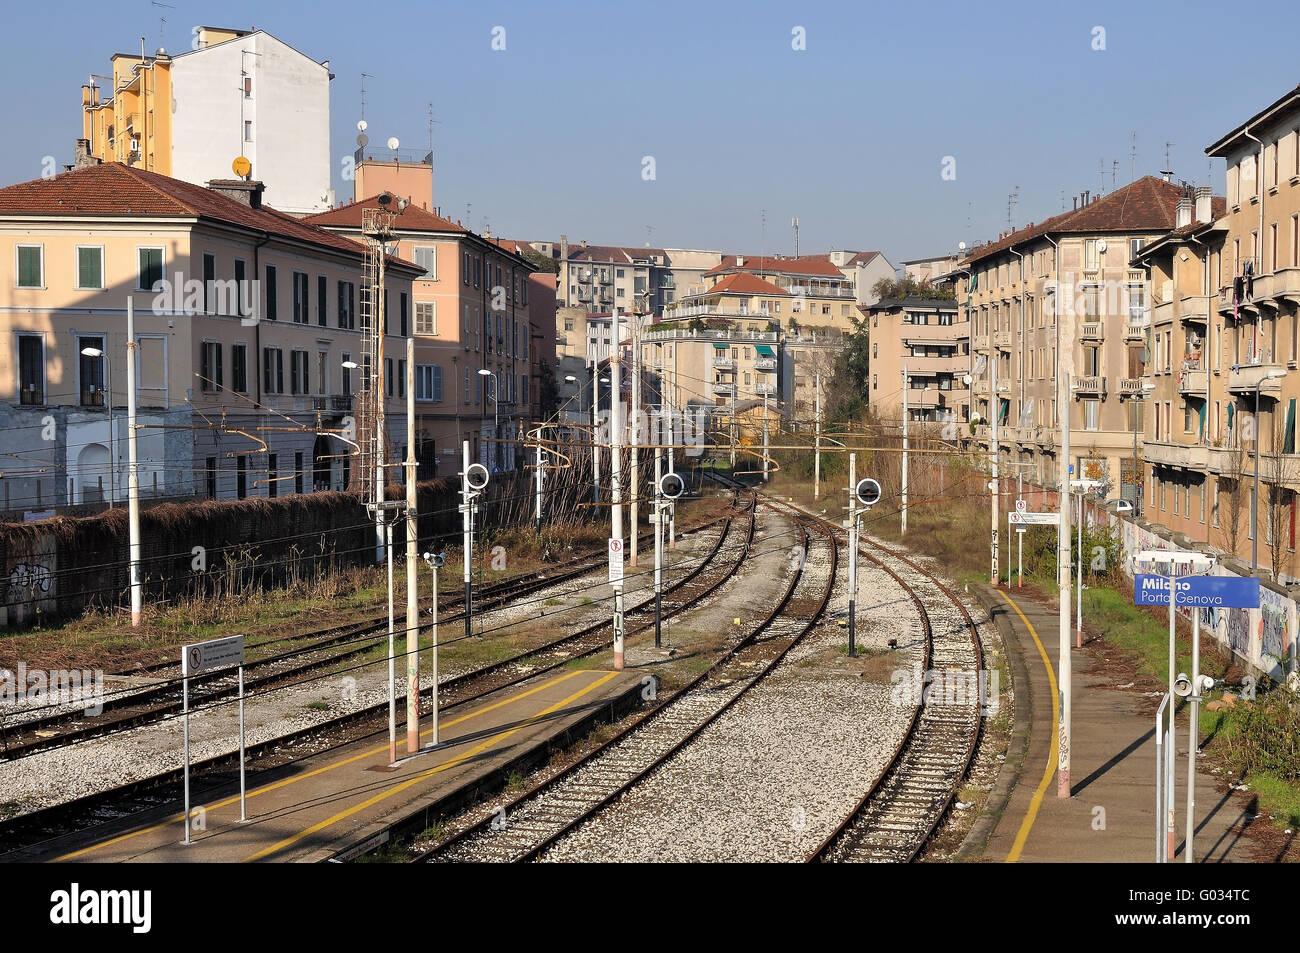 Railway end at porta genova milano stock photo 103331884 - Carabinieri porta genova milano ...